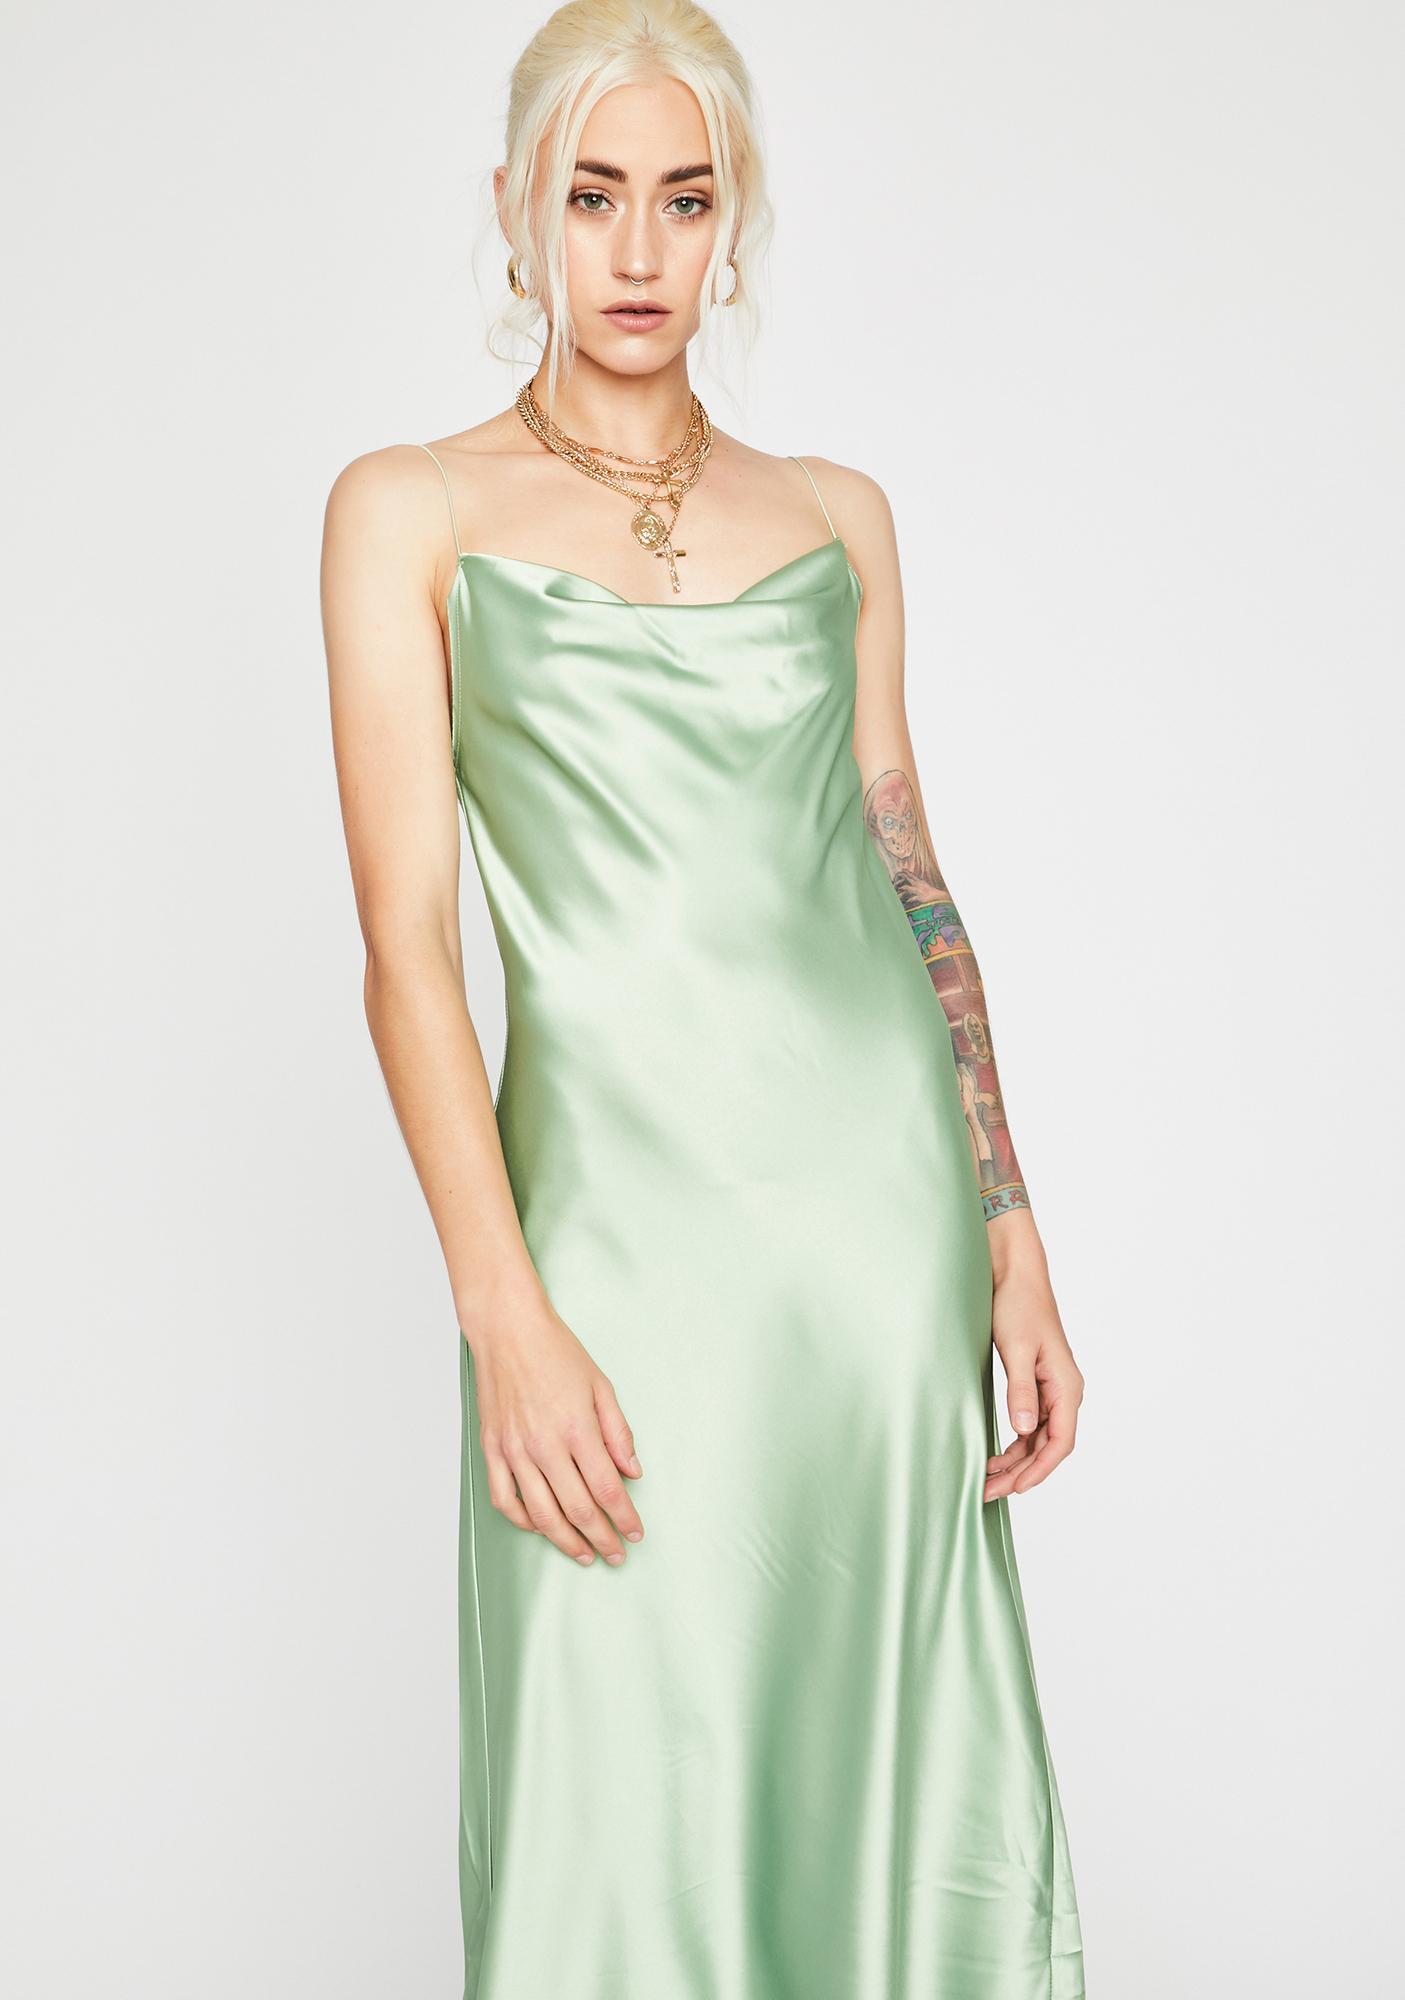 Sage Angel Above Satin Dress